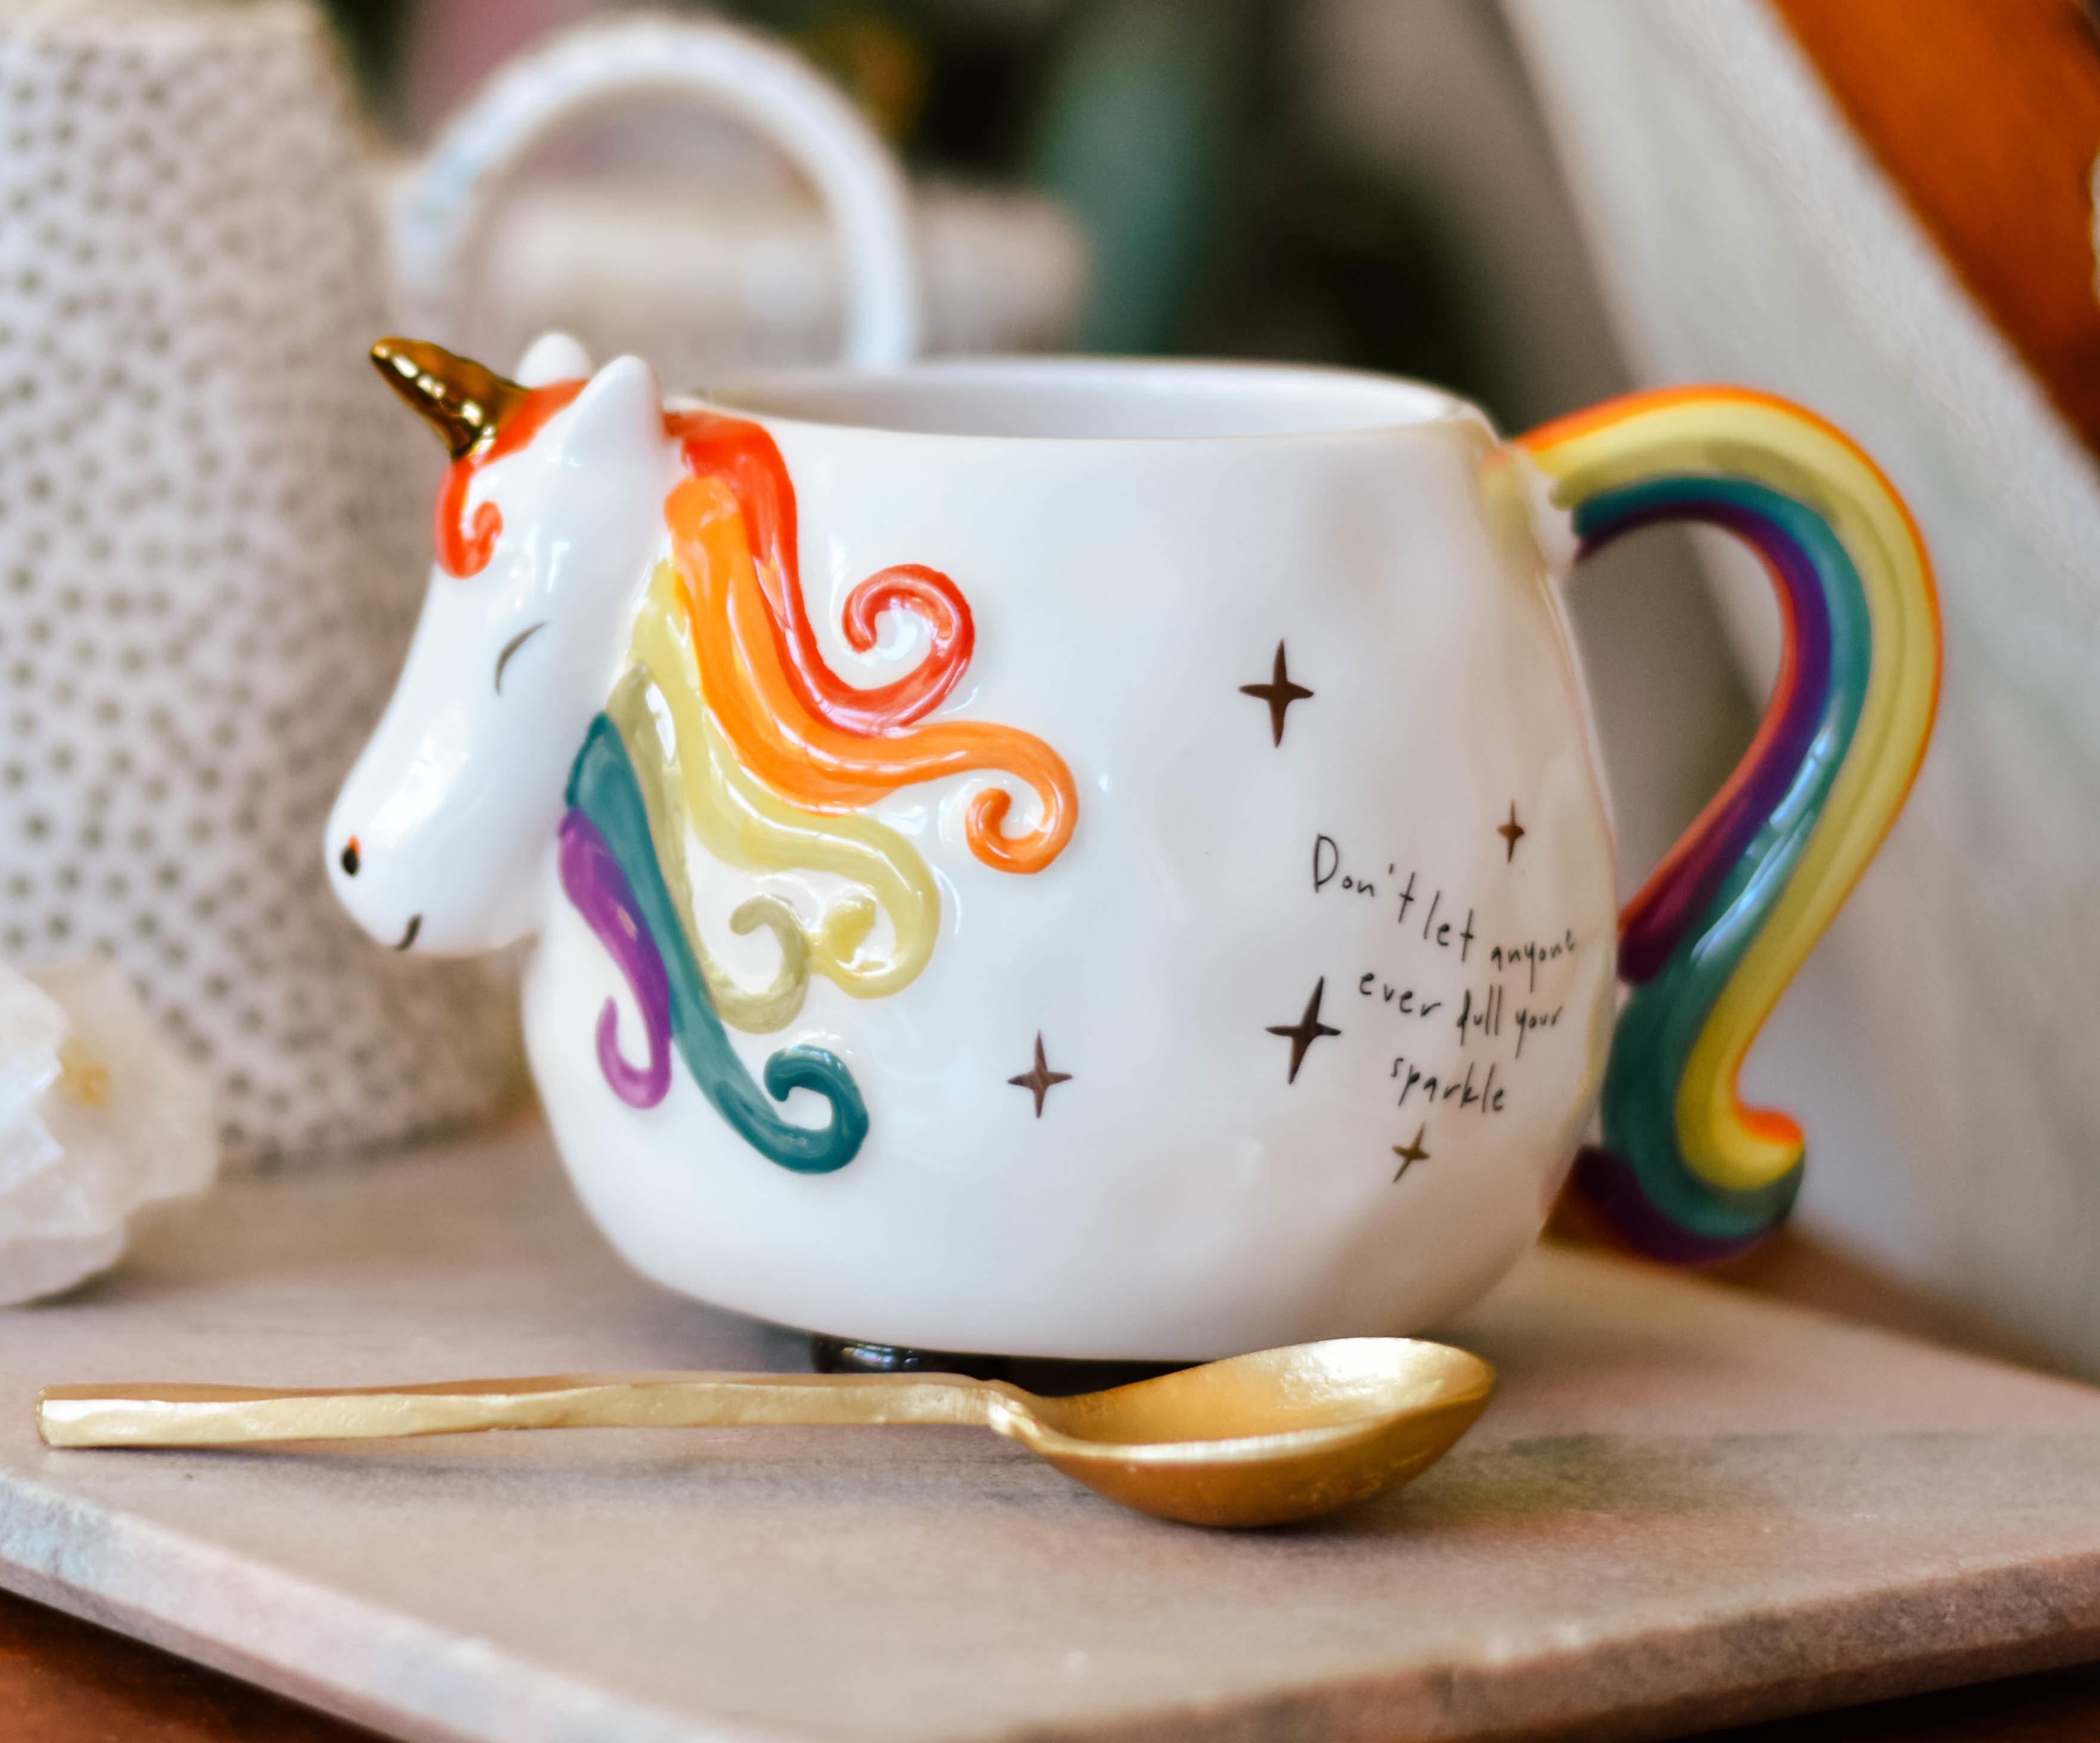 folk mug unicorn mug285 QW7Z5KBJBEJTY